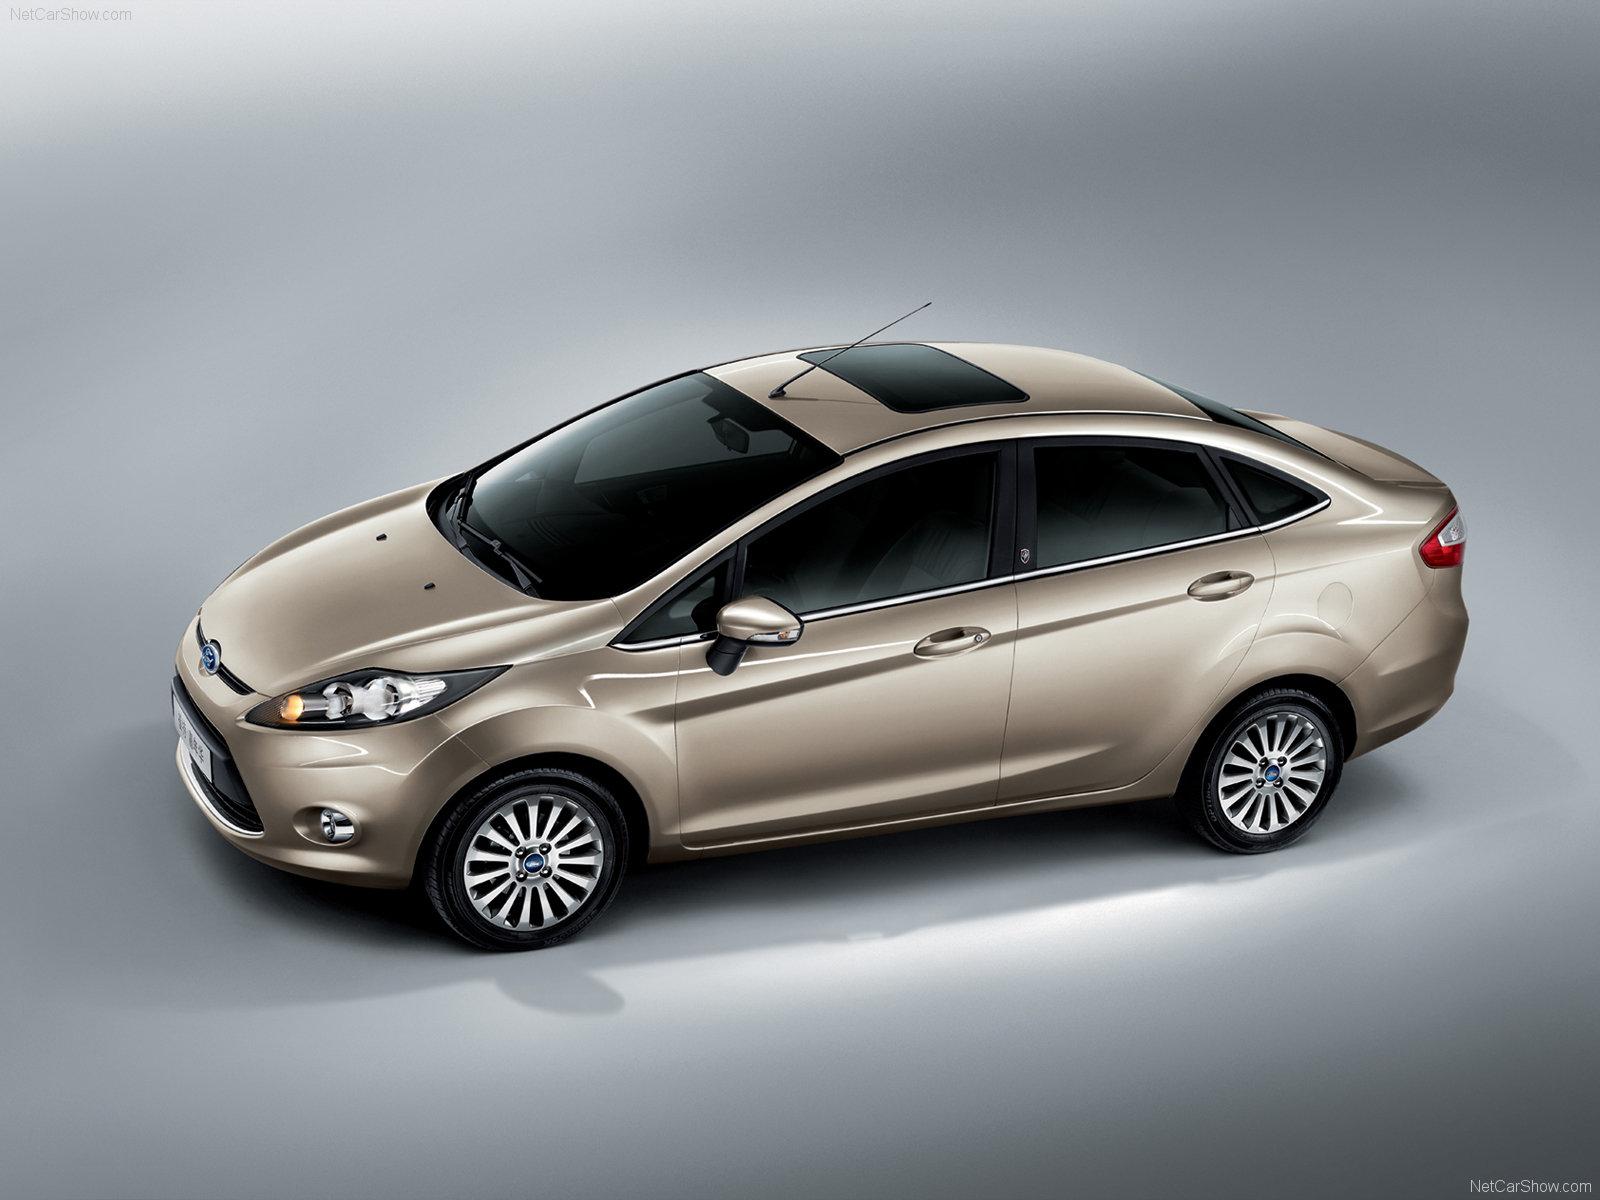 http://3.bp.blogspot.com/_aYHy9i_CR0Y/Swp1ilscYZI/AAAAAAAABcI/VGwugU7sMFo/s1600/Ford-Fiesta_Sedan_2010_1600x1200_wallpaper_02.jpg